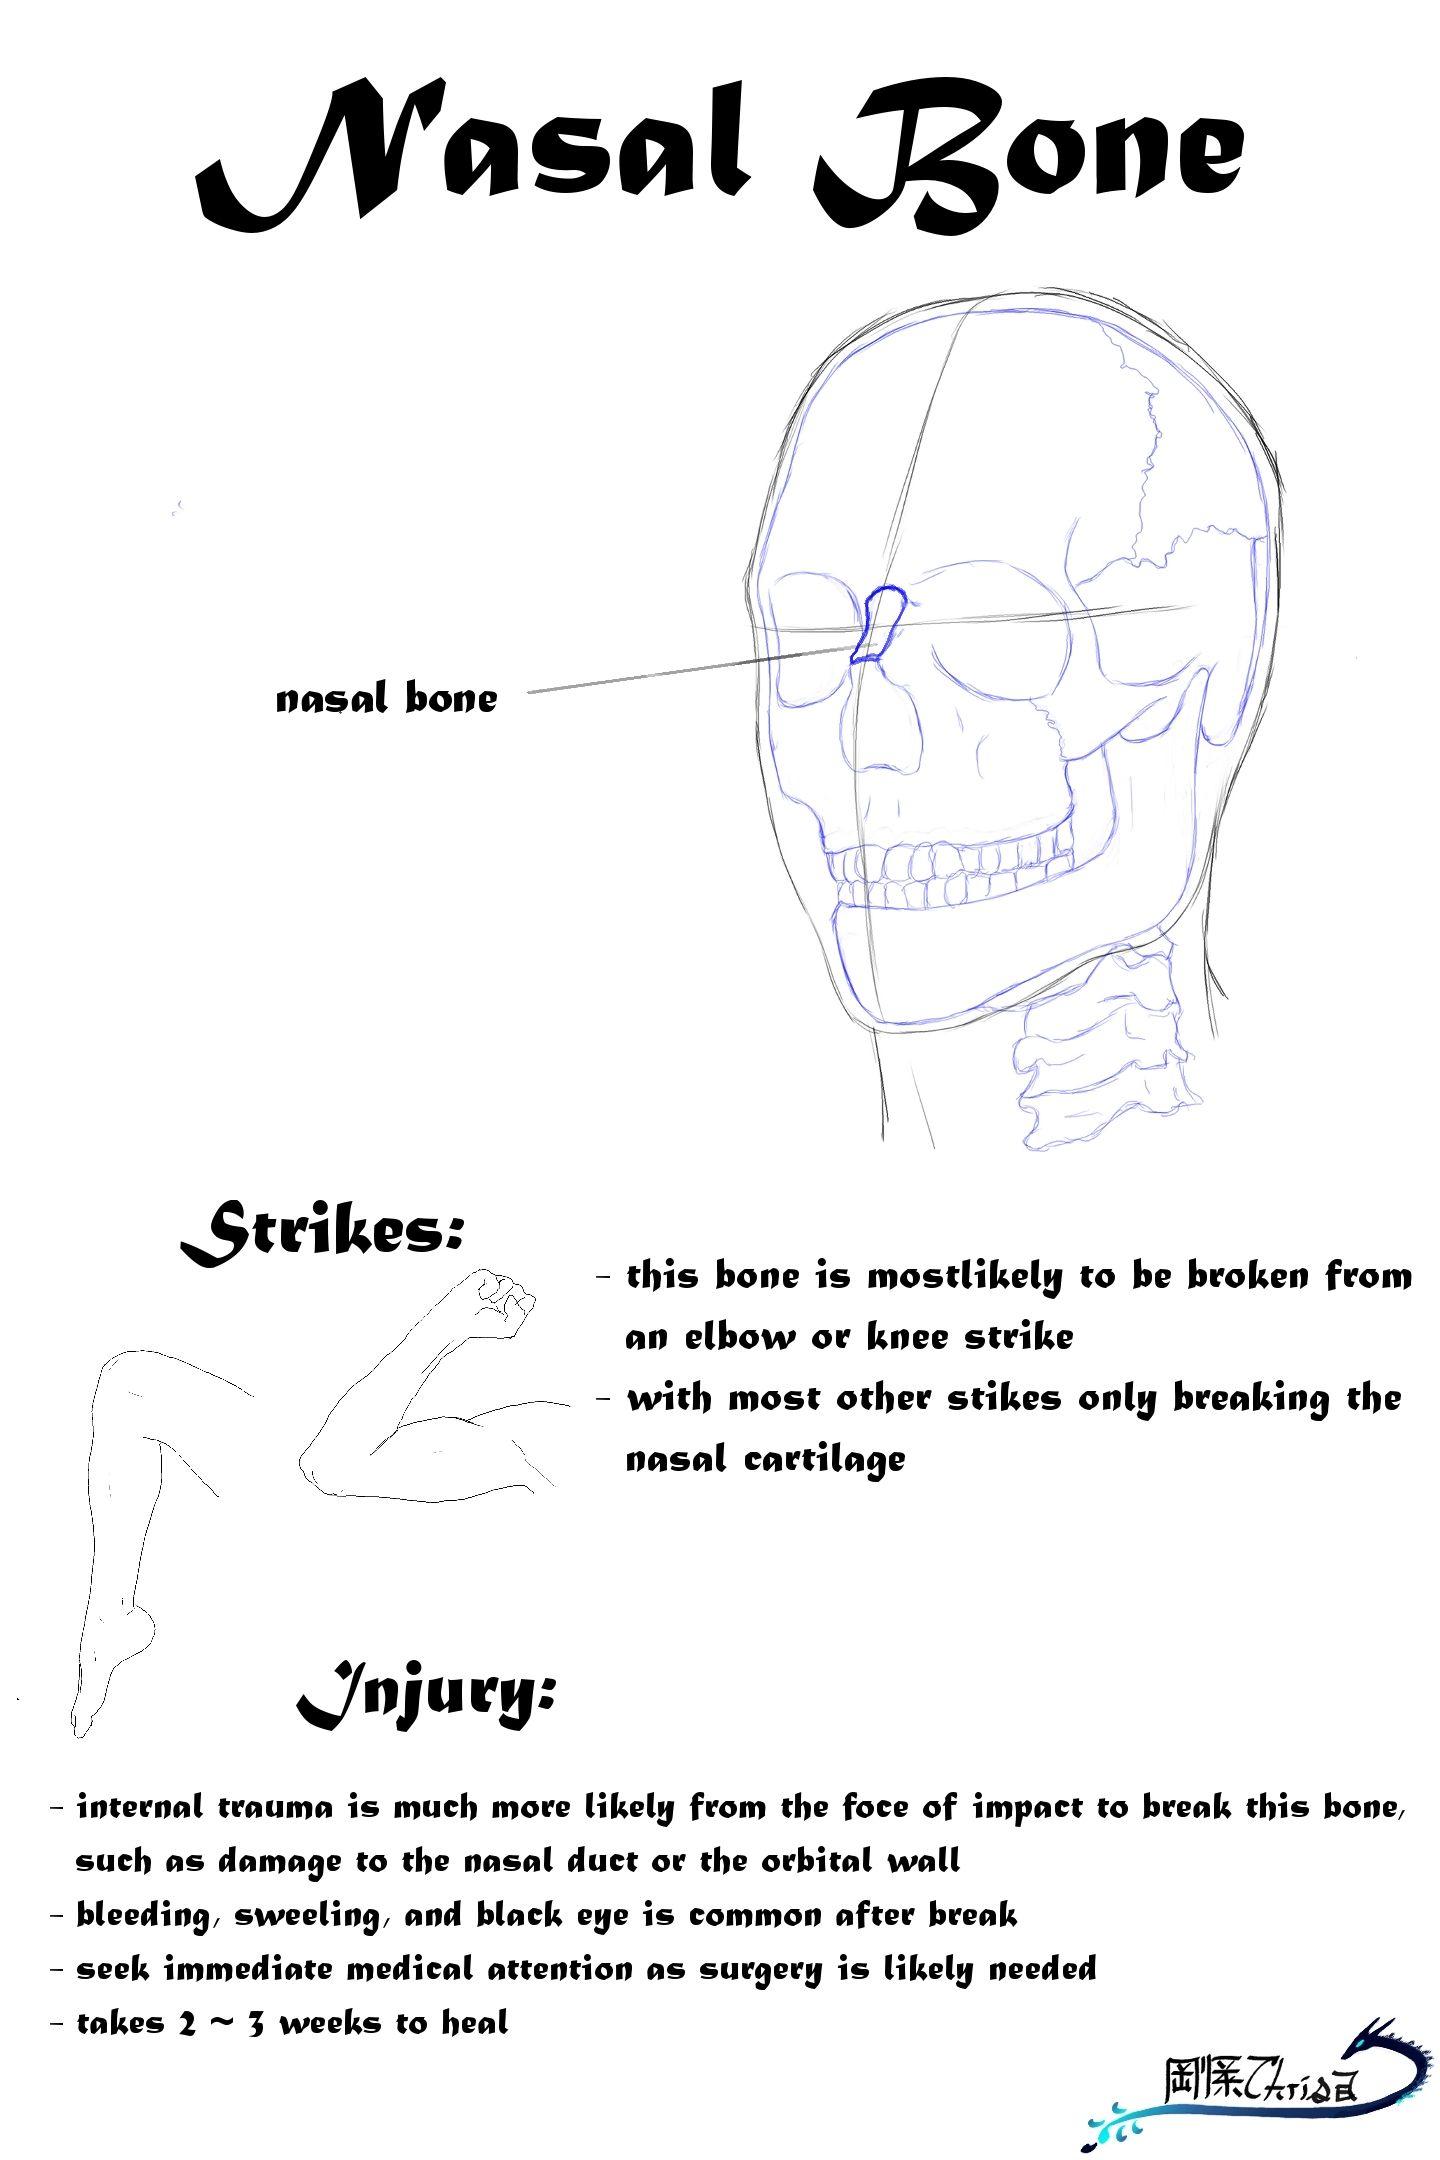 Nasal Bone Anatomy Strikes And Injury Karat Pinterest